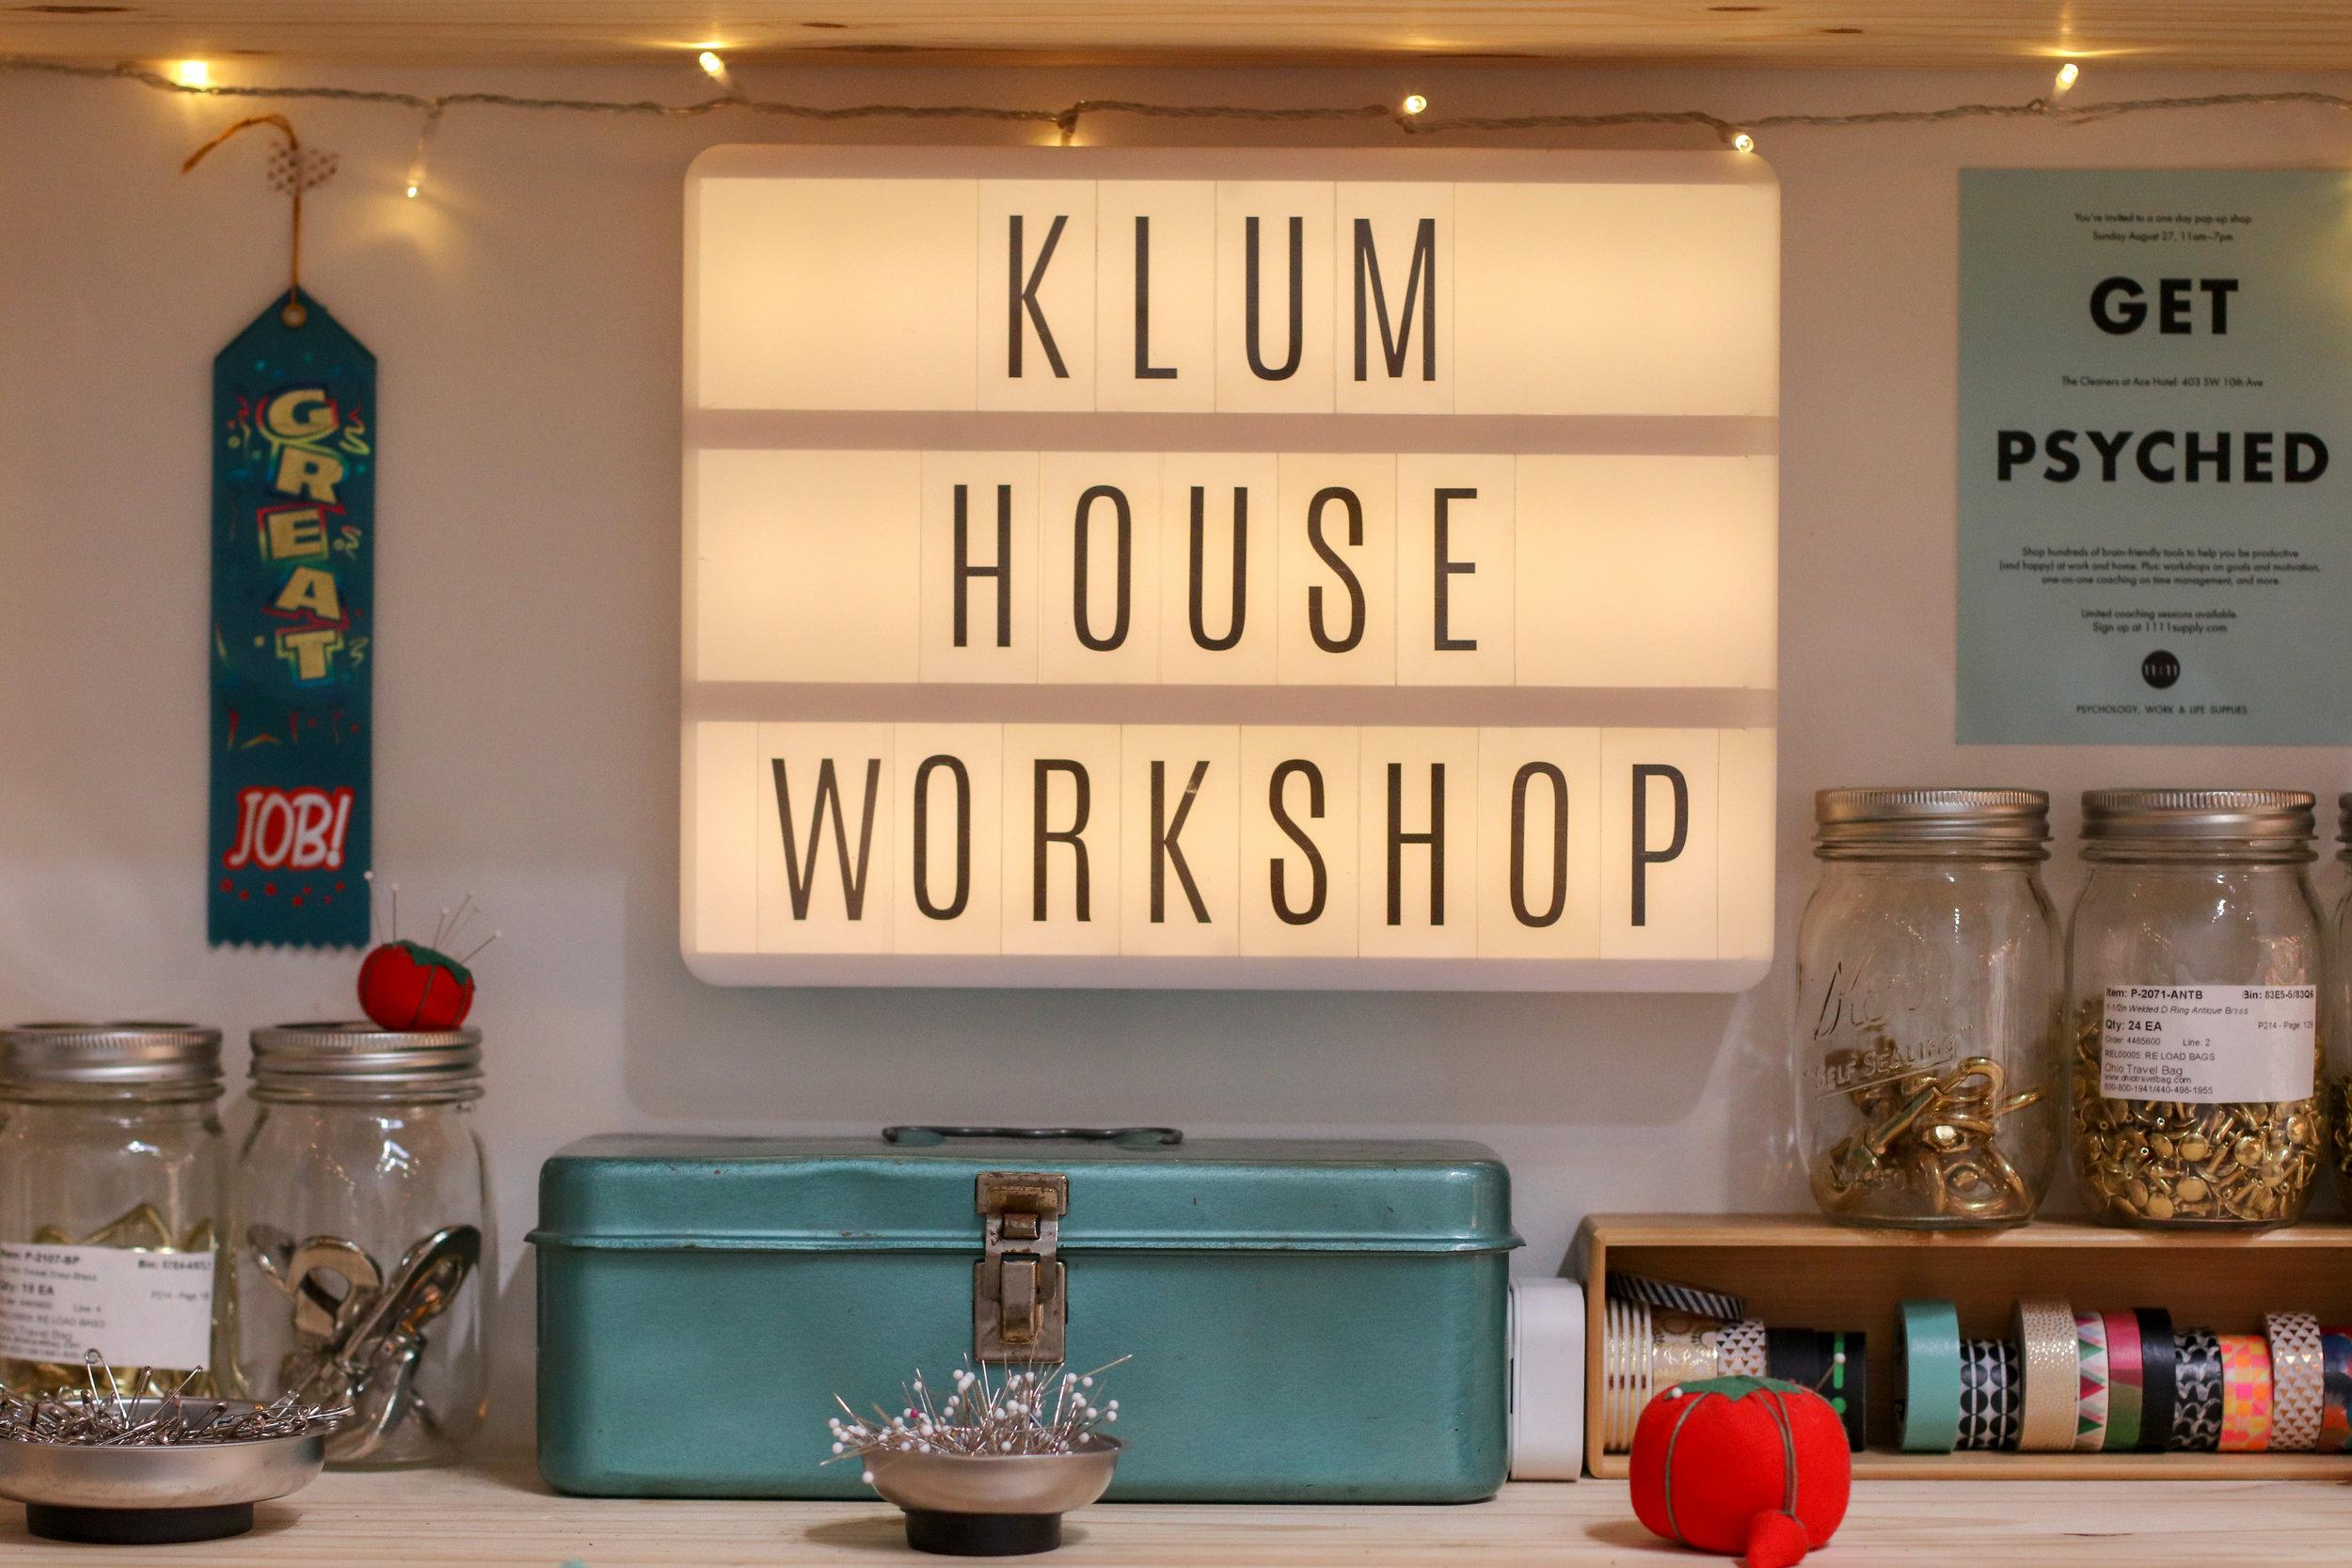 klum house industrial sewing classes portland or-46.jpg